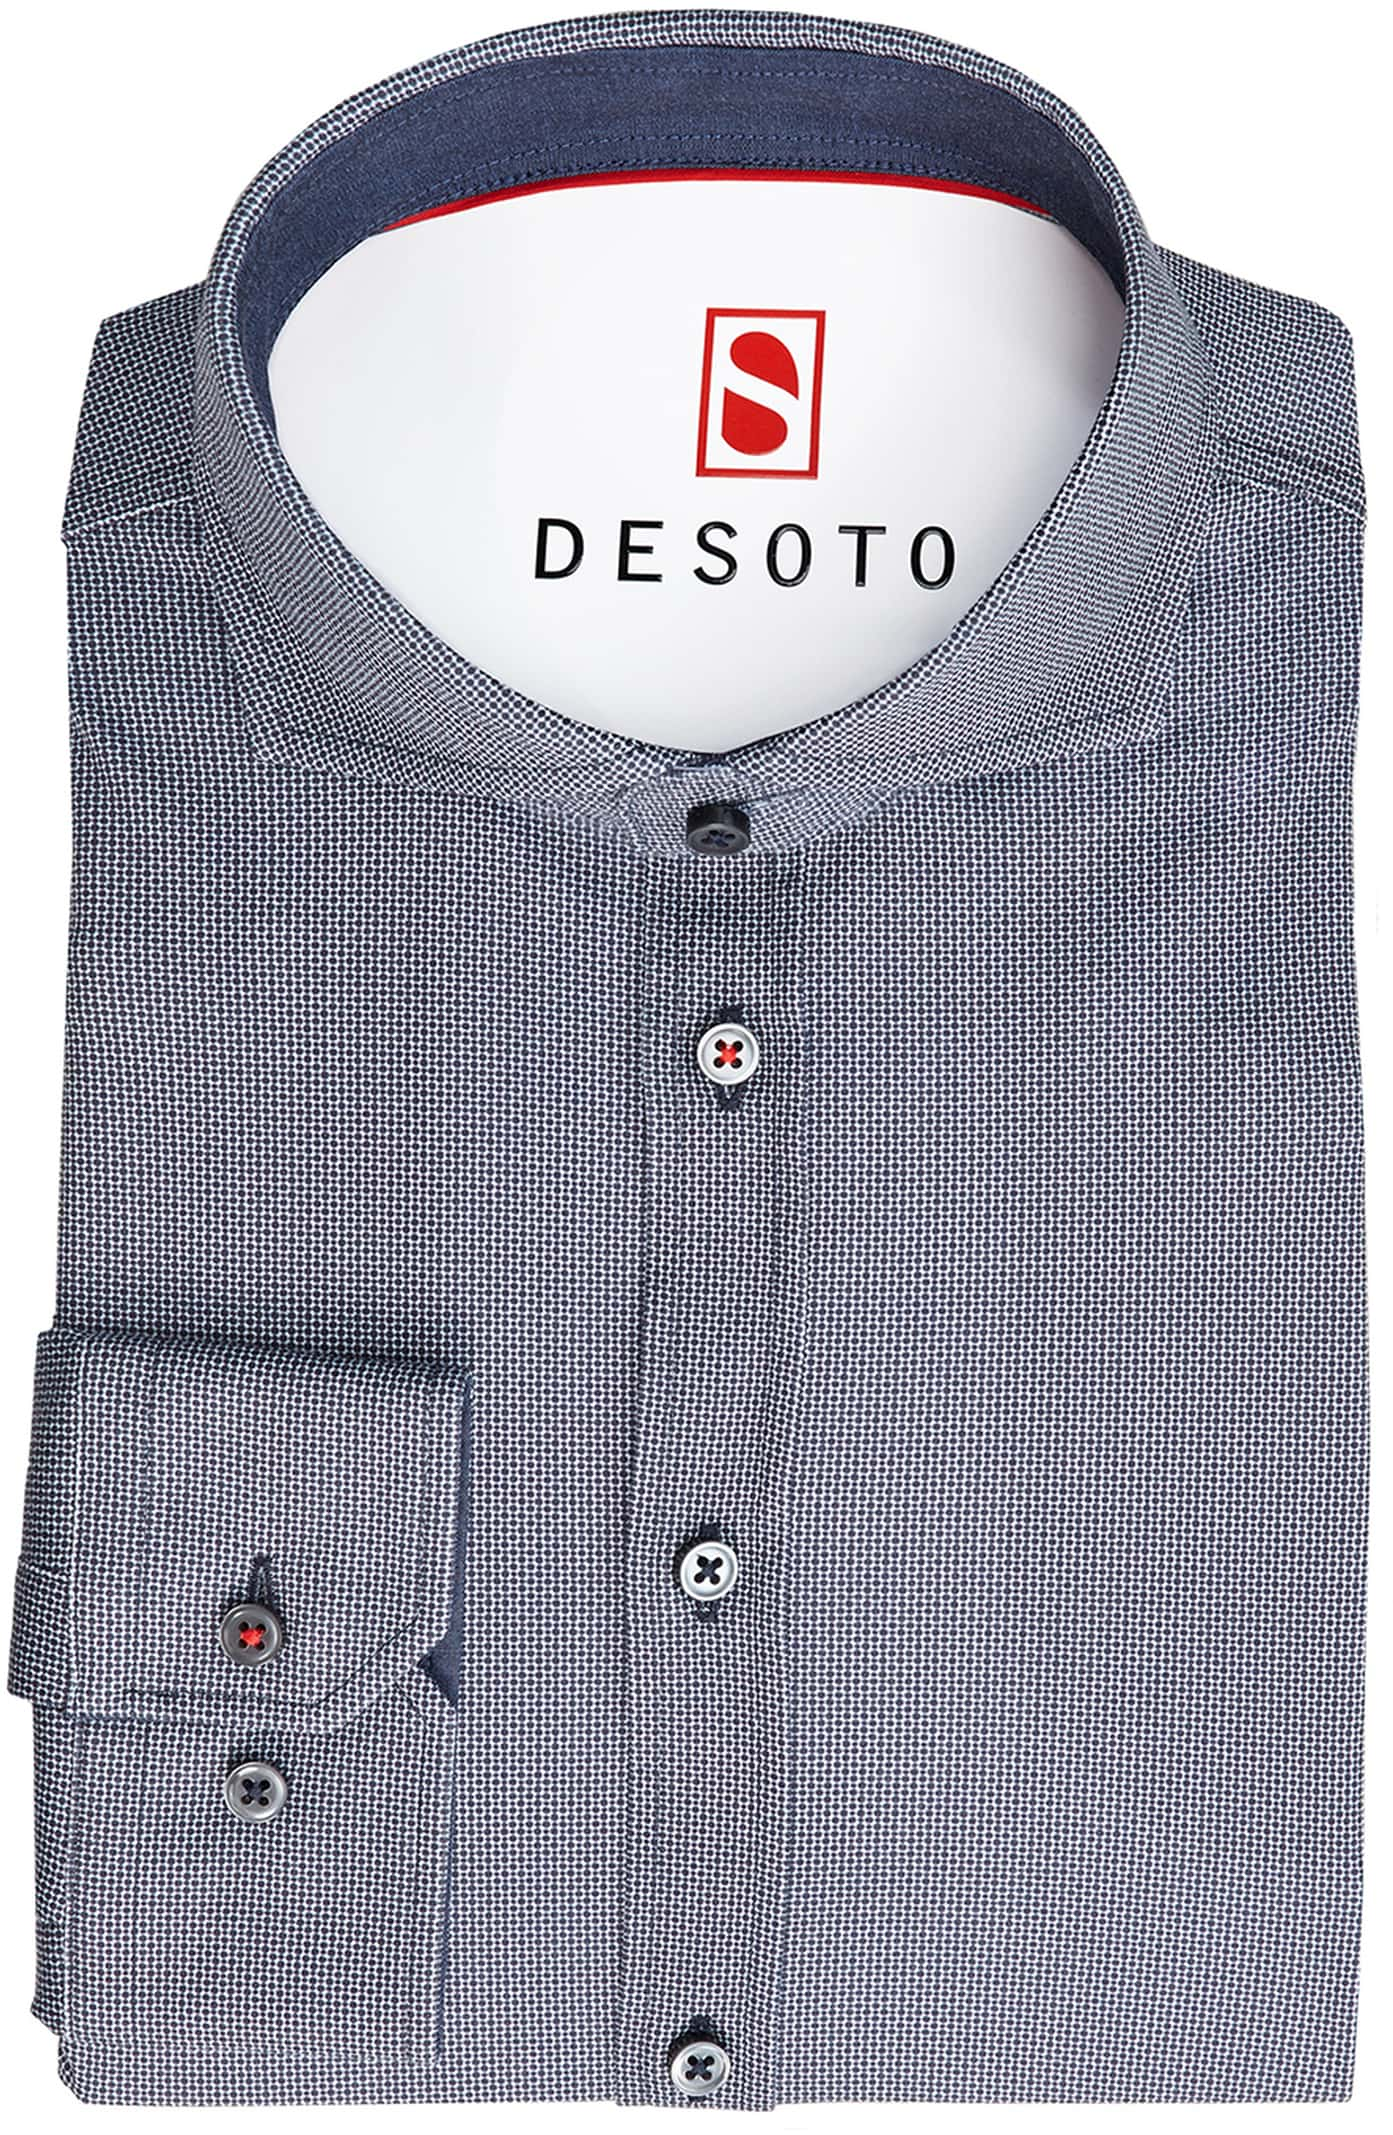 Desoto Overhemd Strijkvrij Donkerblauw Print foto 2